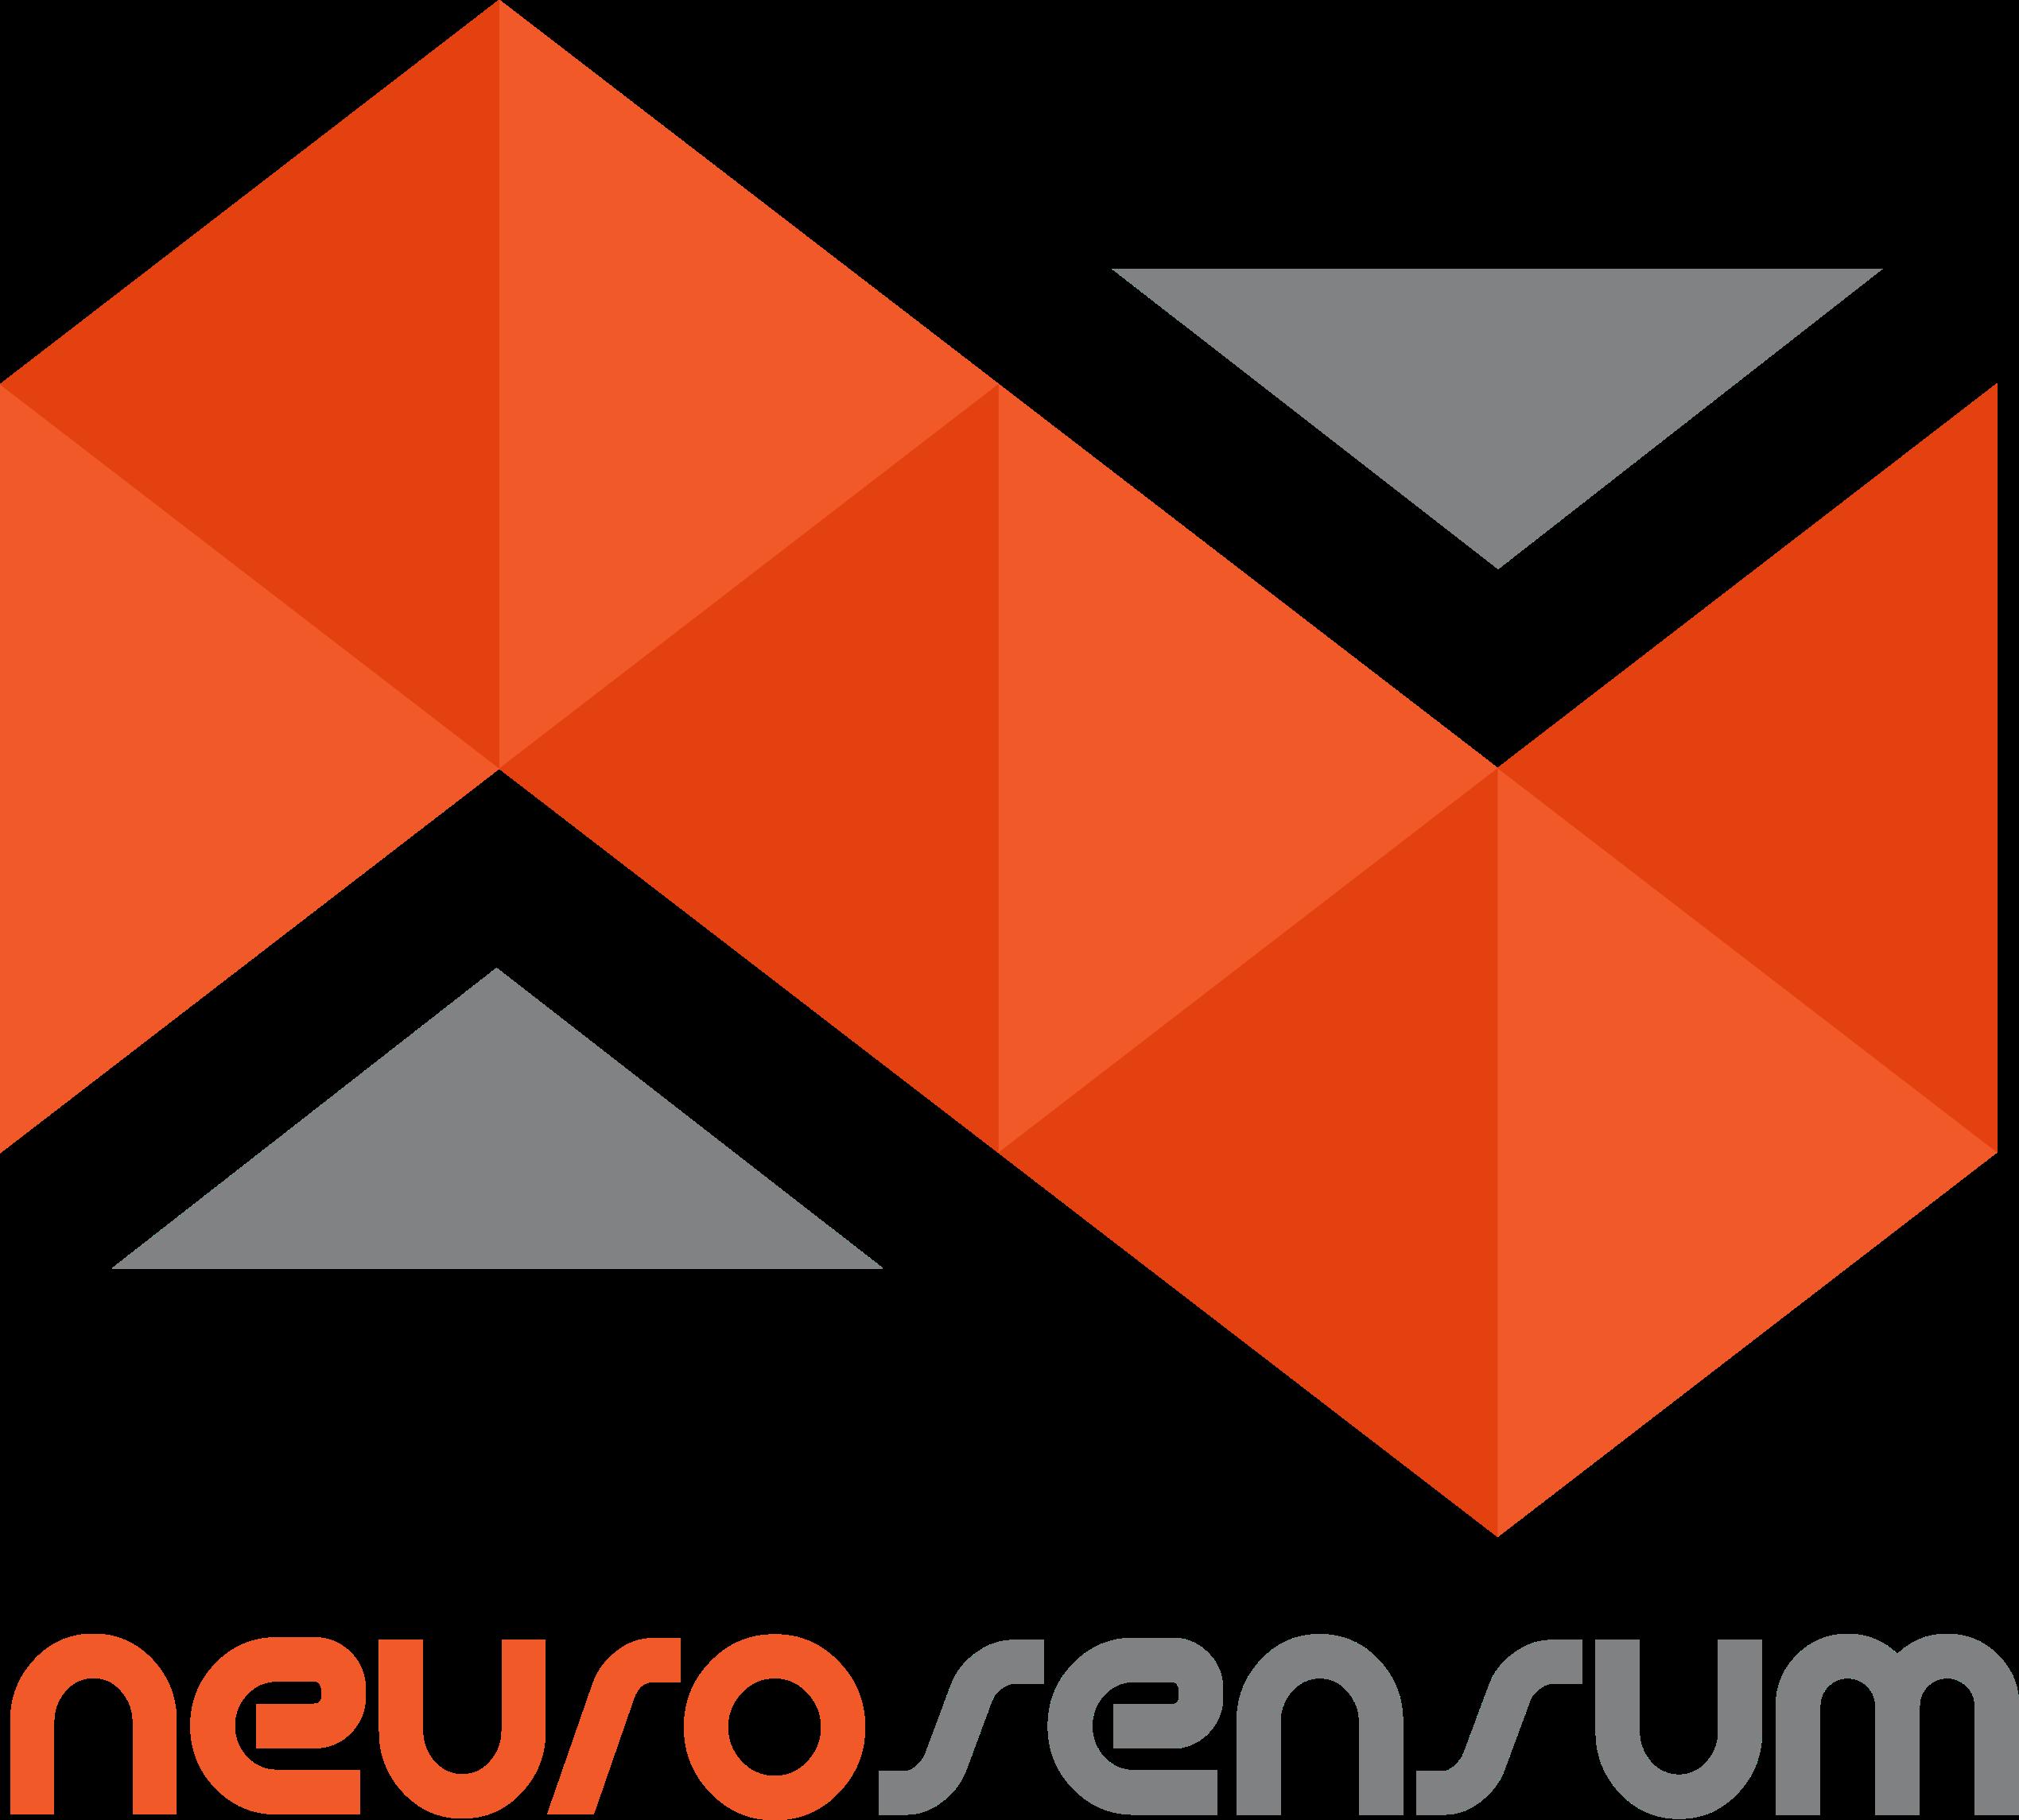 Neurosensum